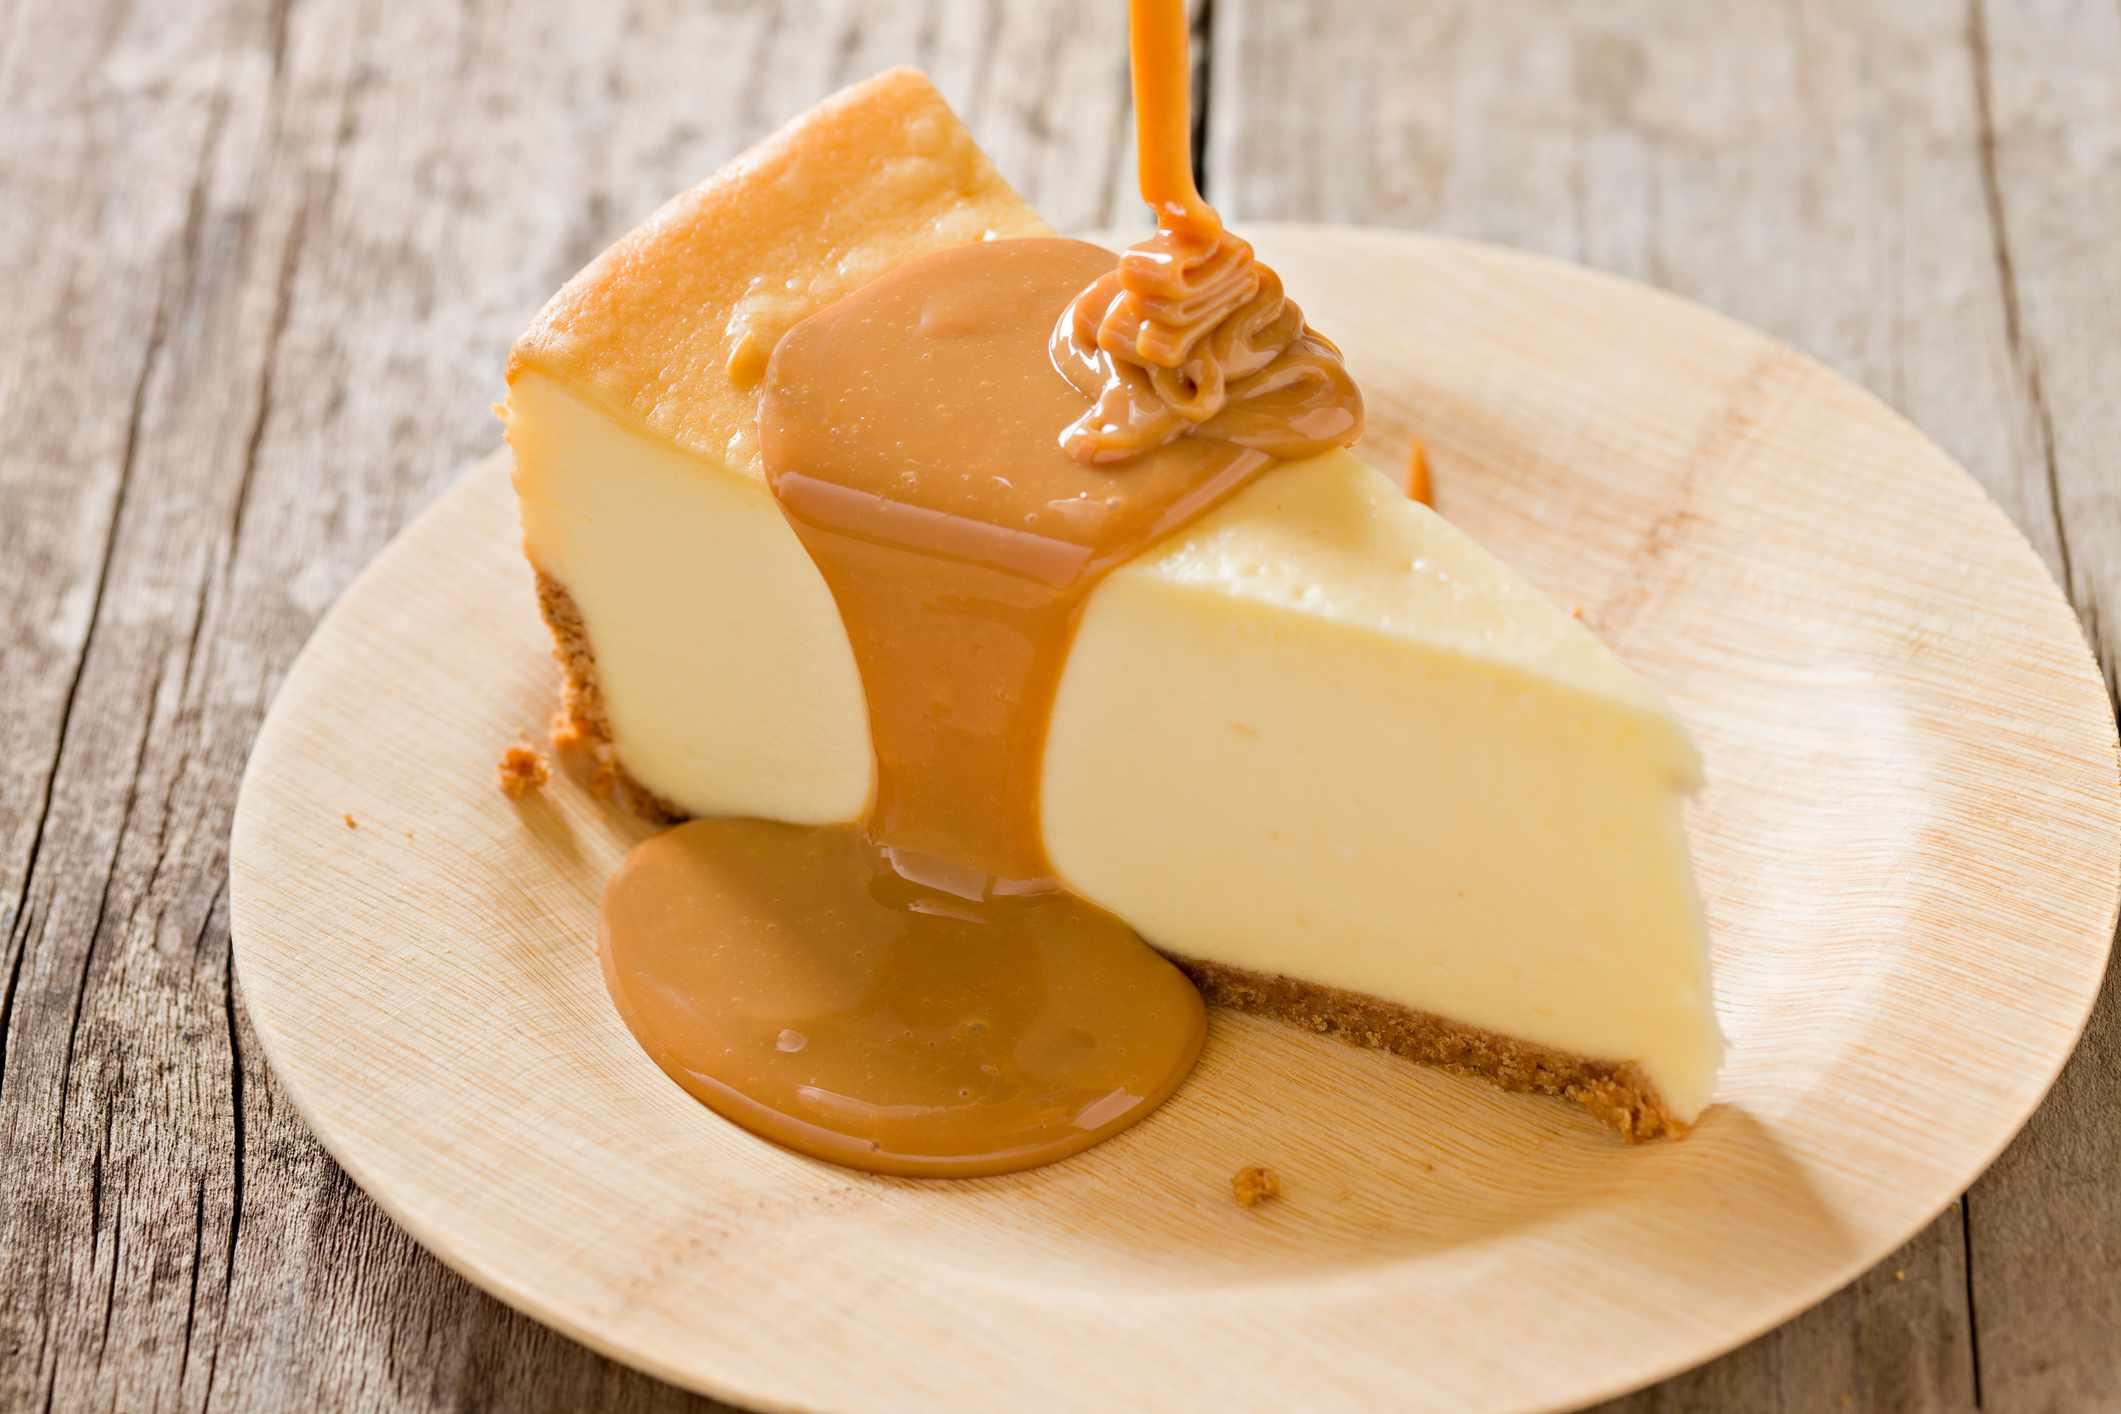 dulce de leche drizzled over cheesecake